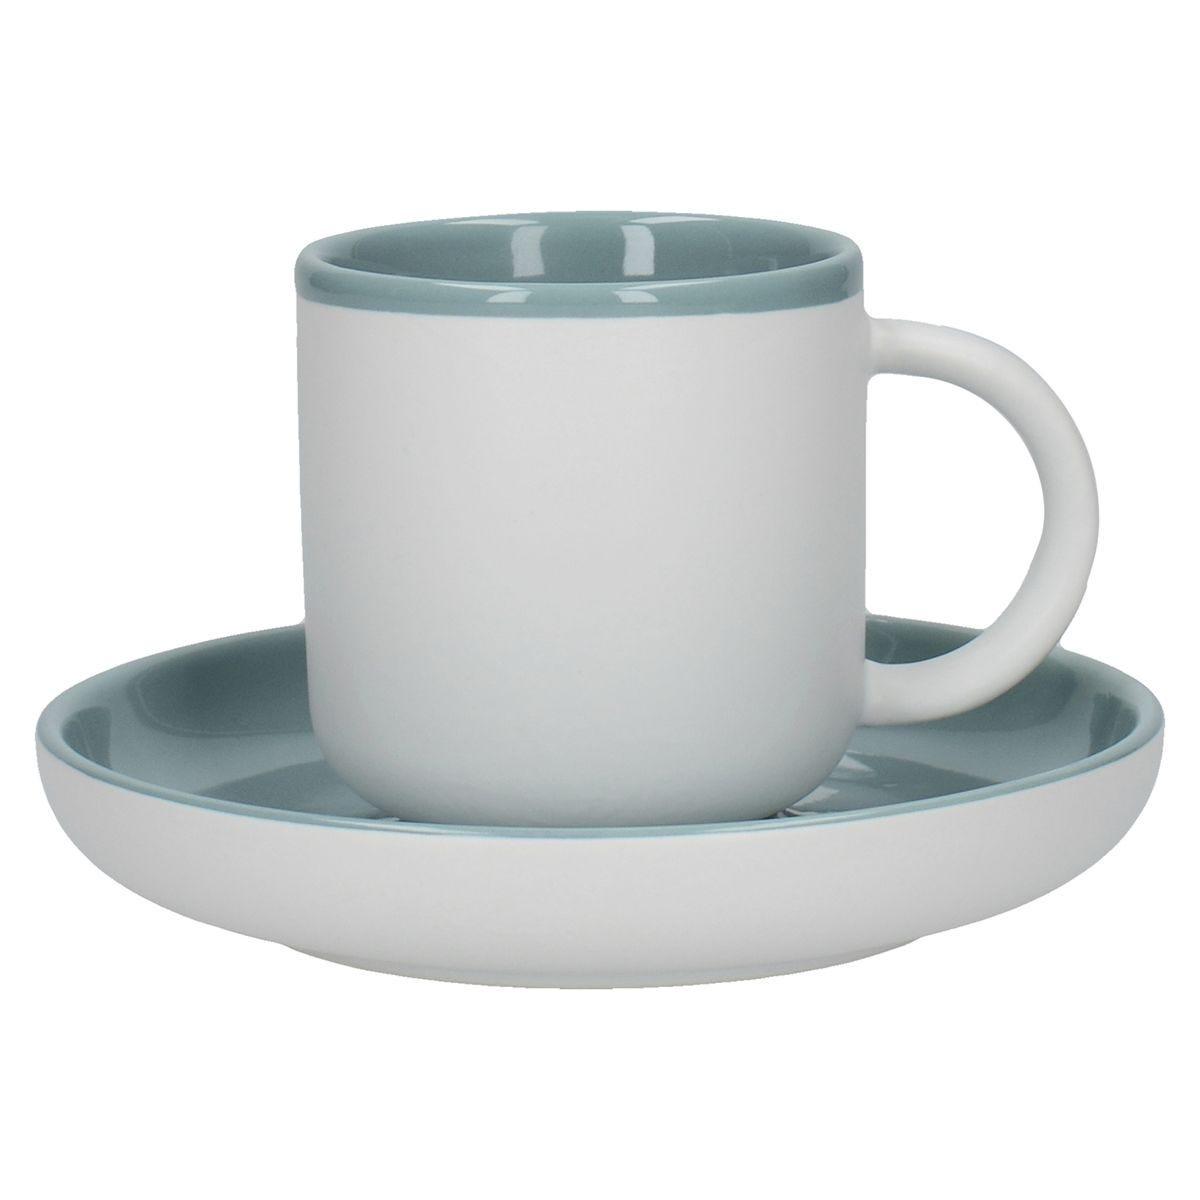 La Cafetiere Ceramic Barcelona Espresso Cup and Saucer - Retro Blue 120ml